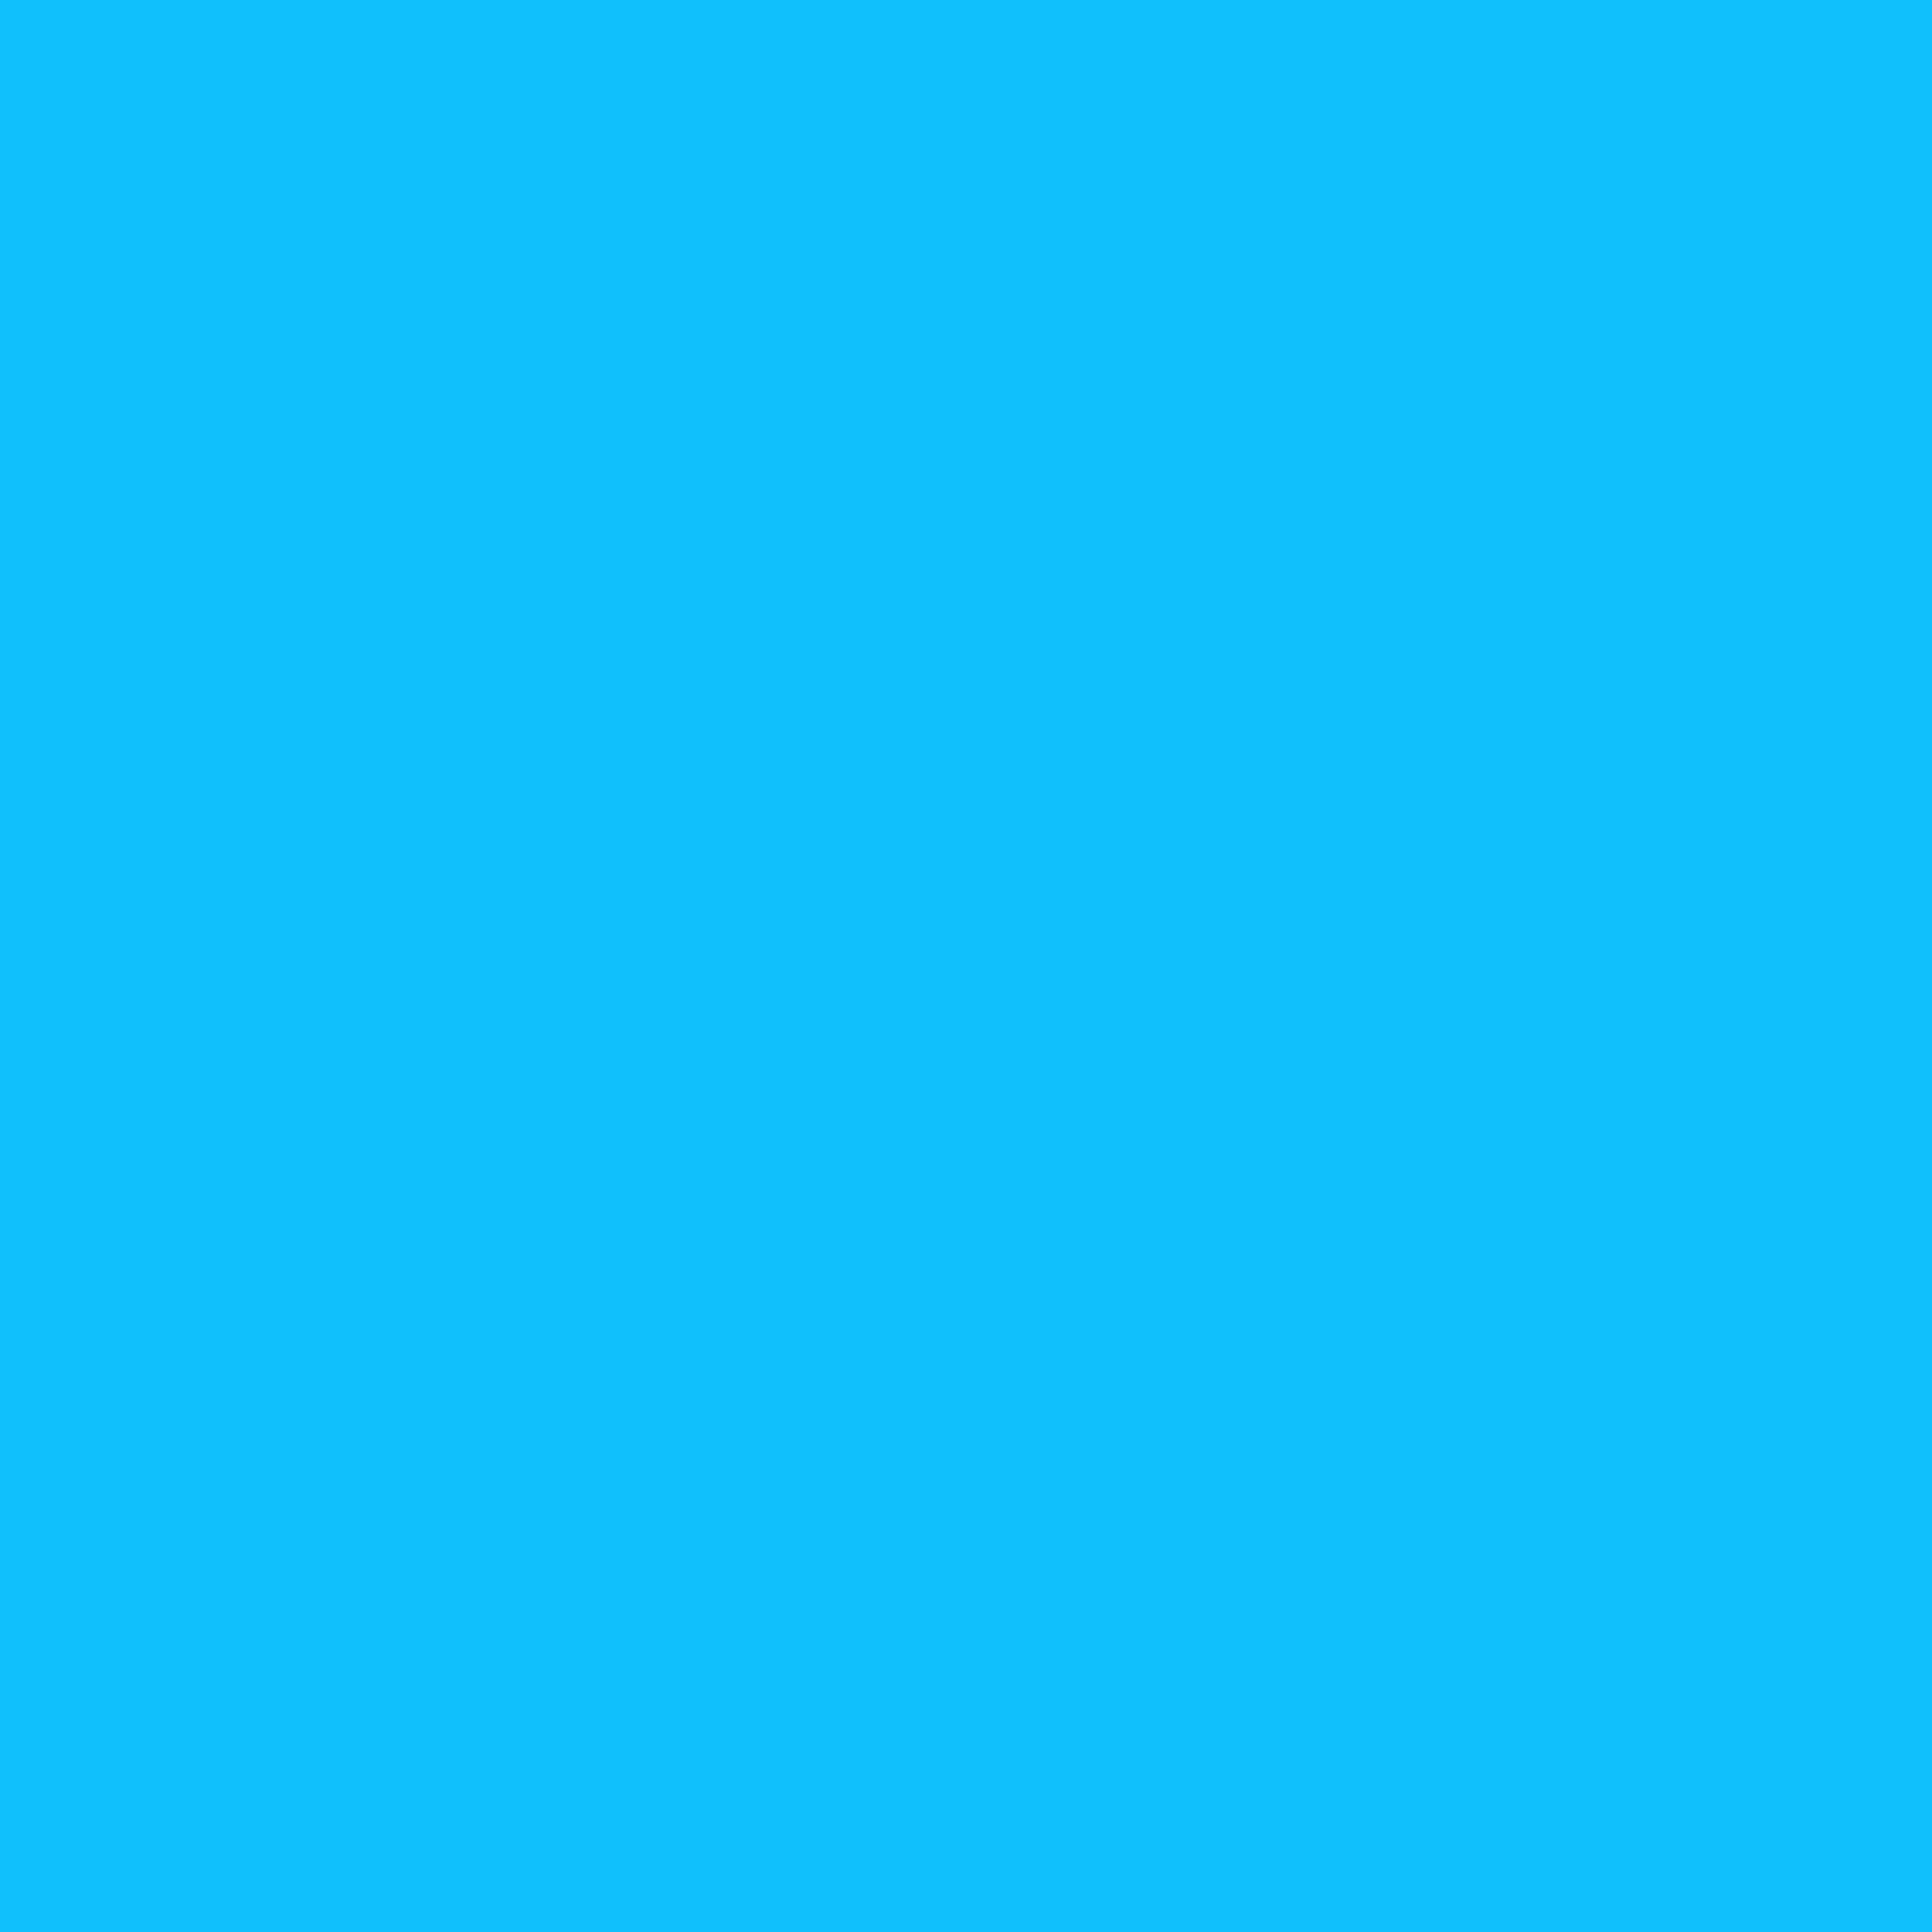 2732x2732 Spiro Disco Ball Solid Color Background